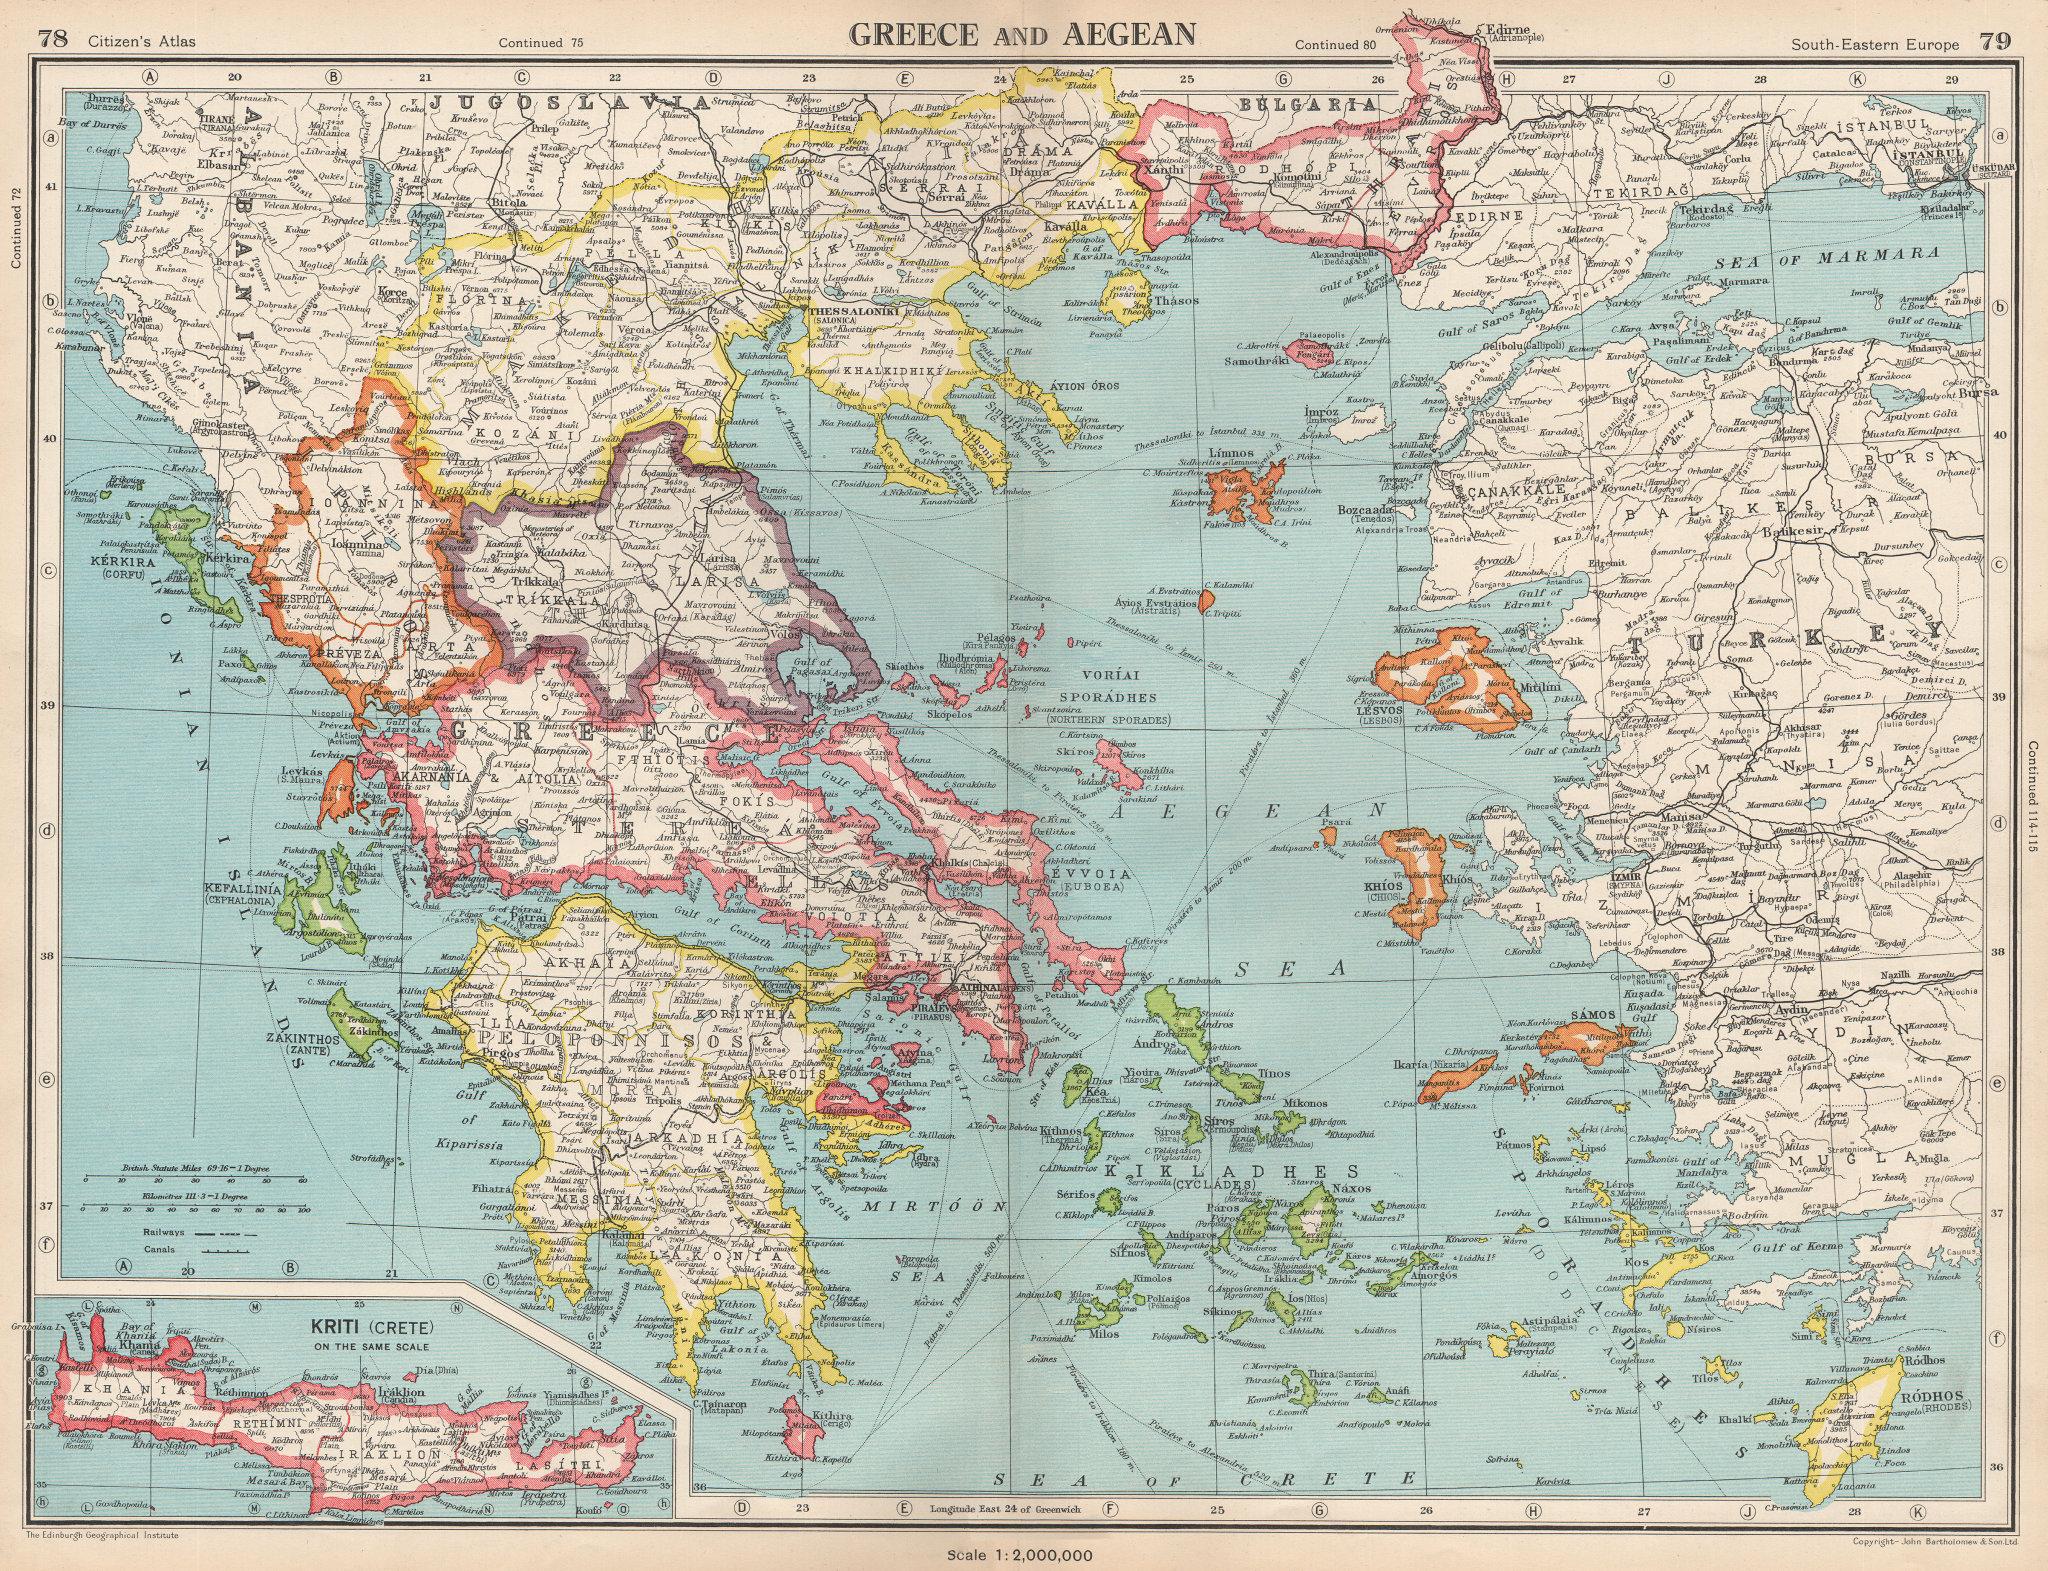 GREECE AND AEGEAN. Crete Cyclades Sporades Dodecanese &c. BARTHOLOMEW 1952 map